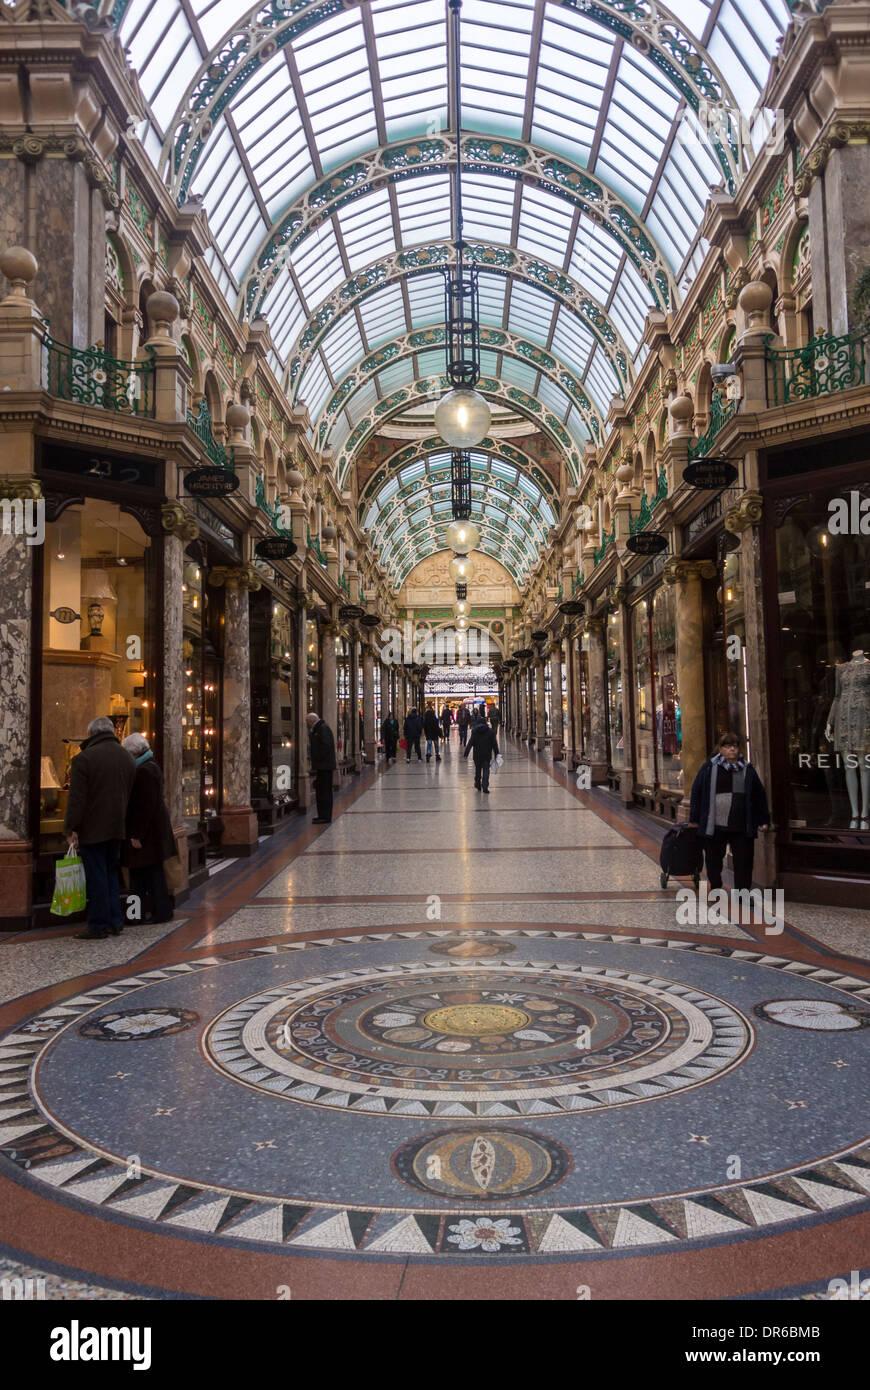 County Arcade, Victoria Quarter, Leeds. - Stock Image